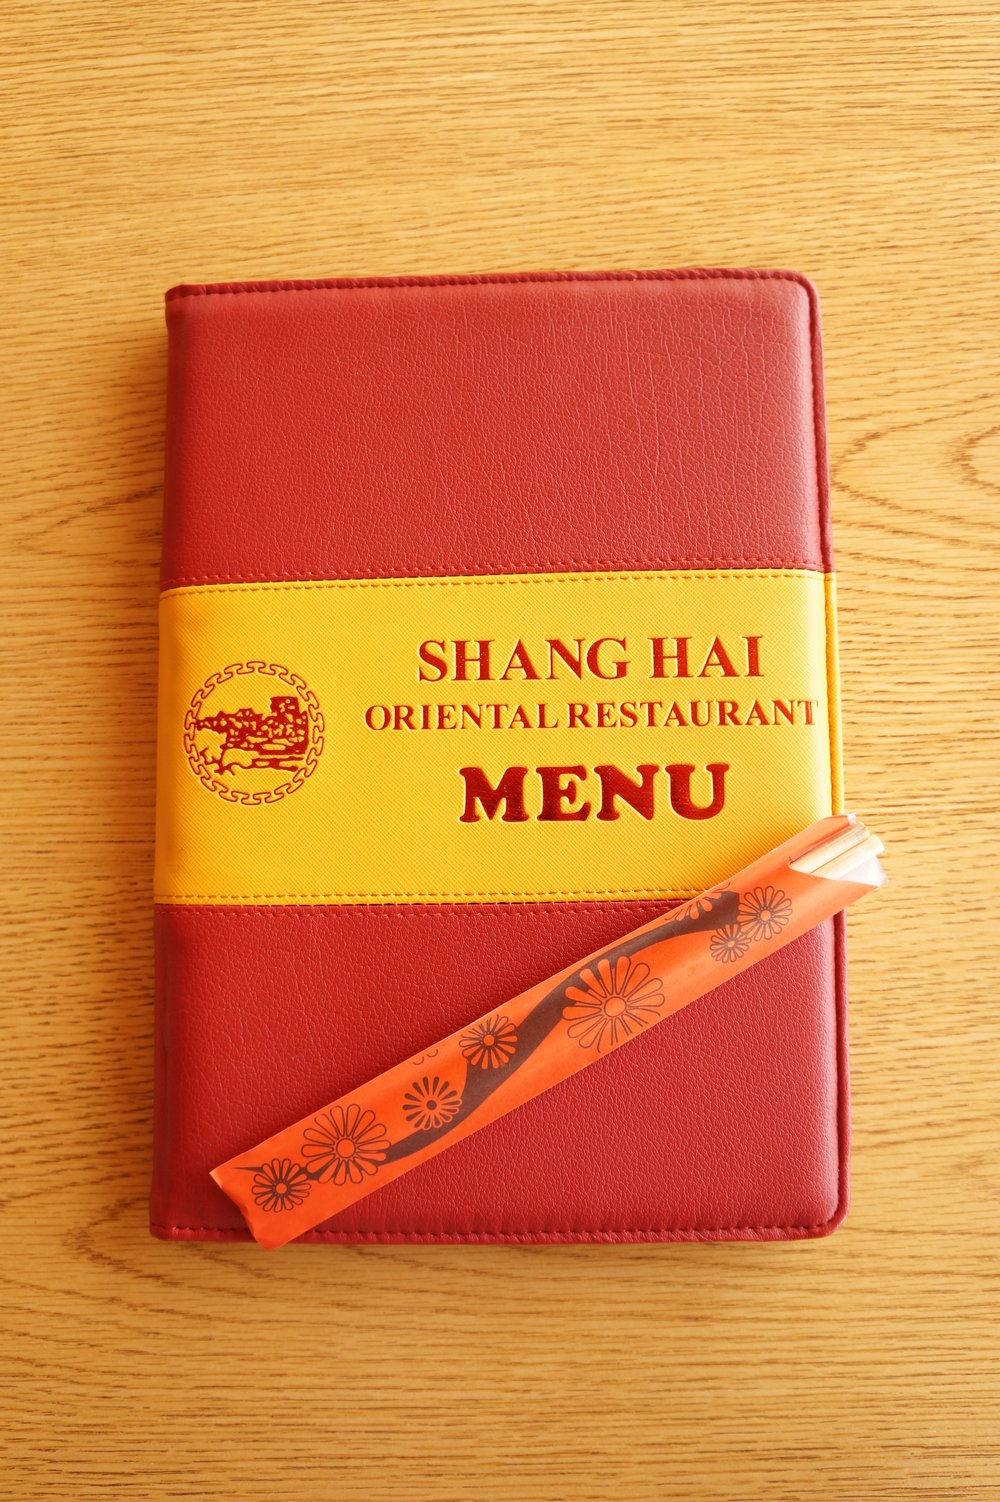 Andrea-Fenise-Shang-Hai-Restaurant-Review-Memphis